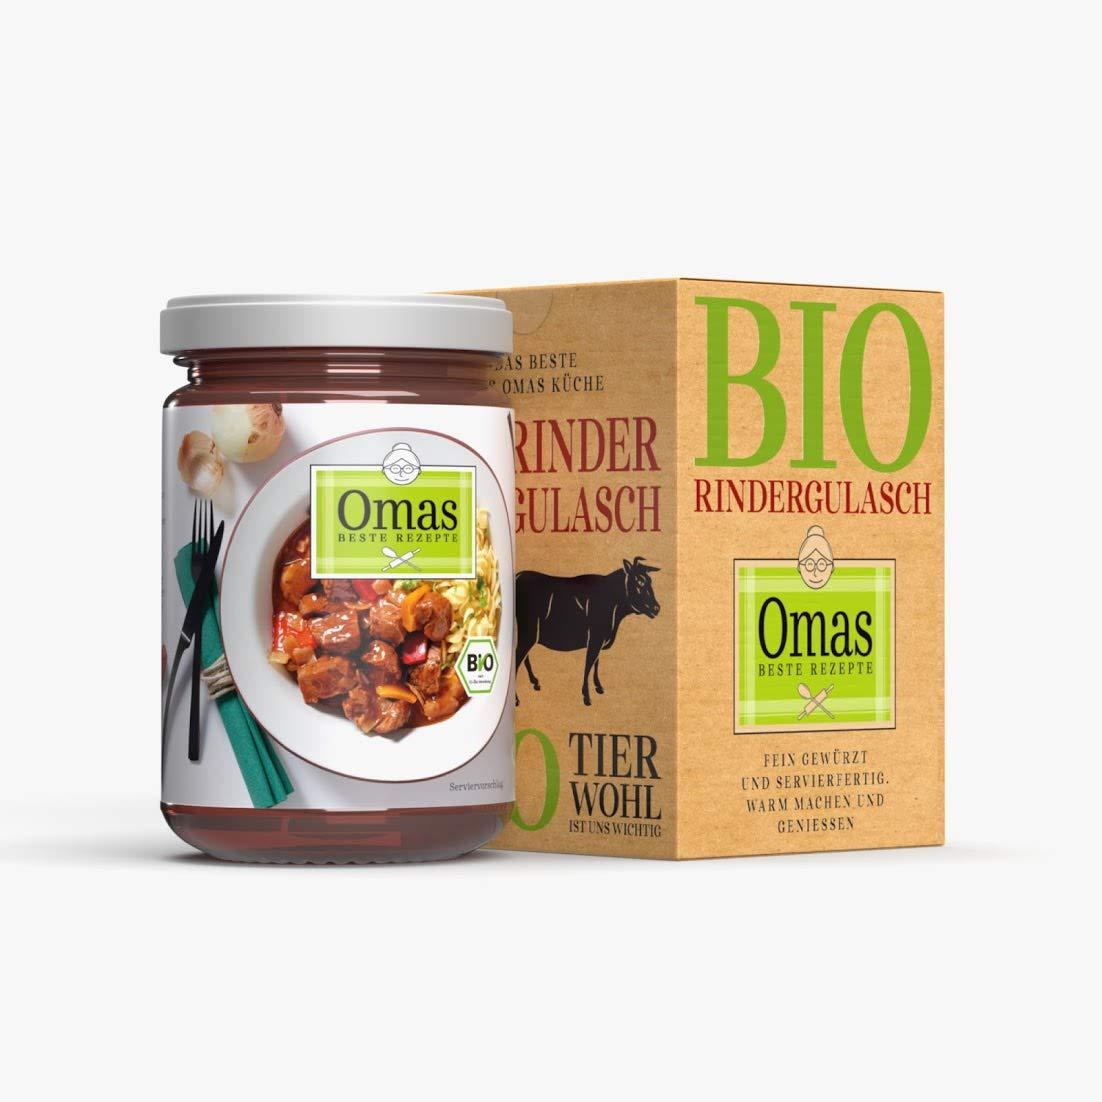 Omas beste Rezepte: Bio Rindergulasch